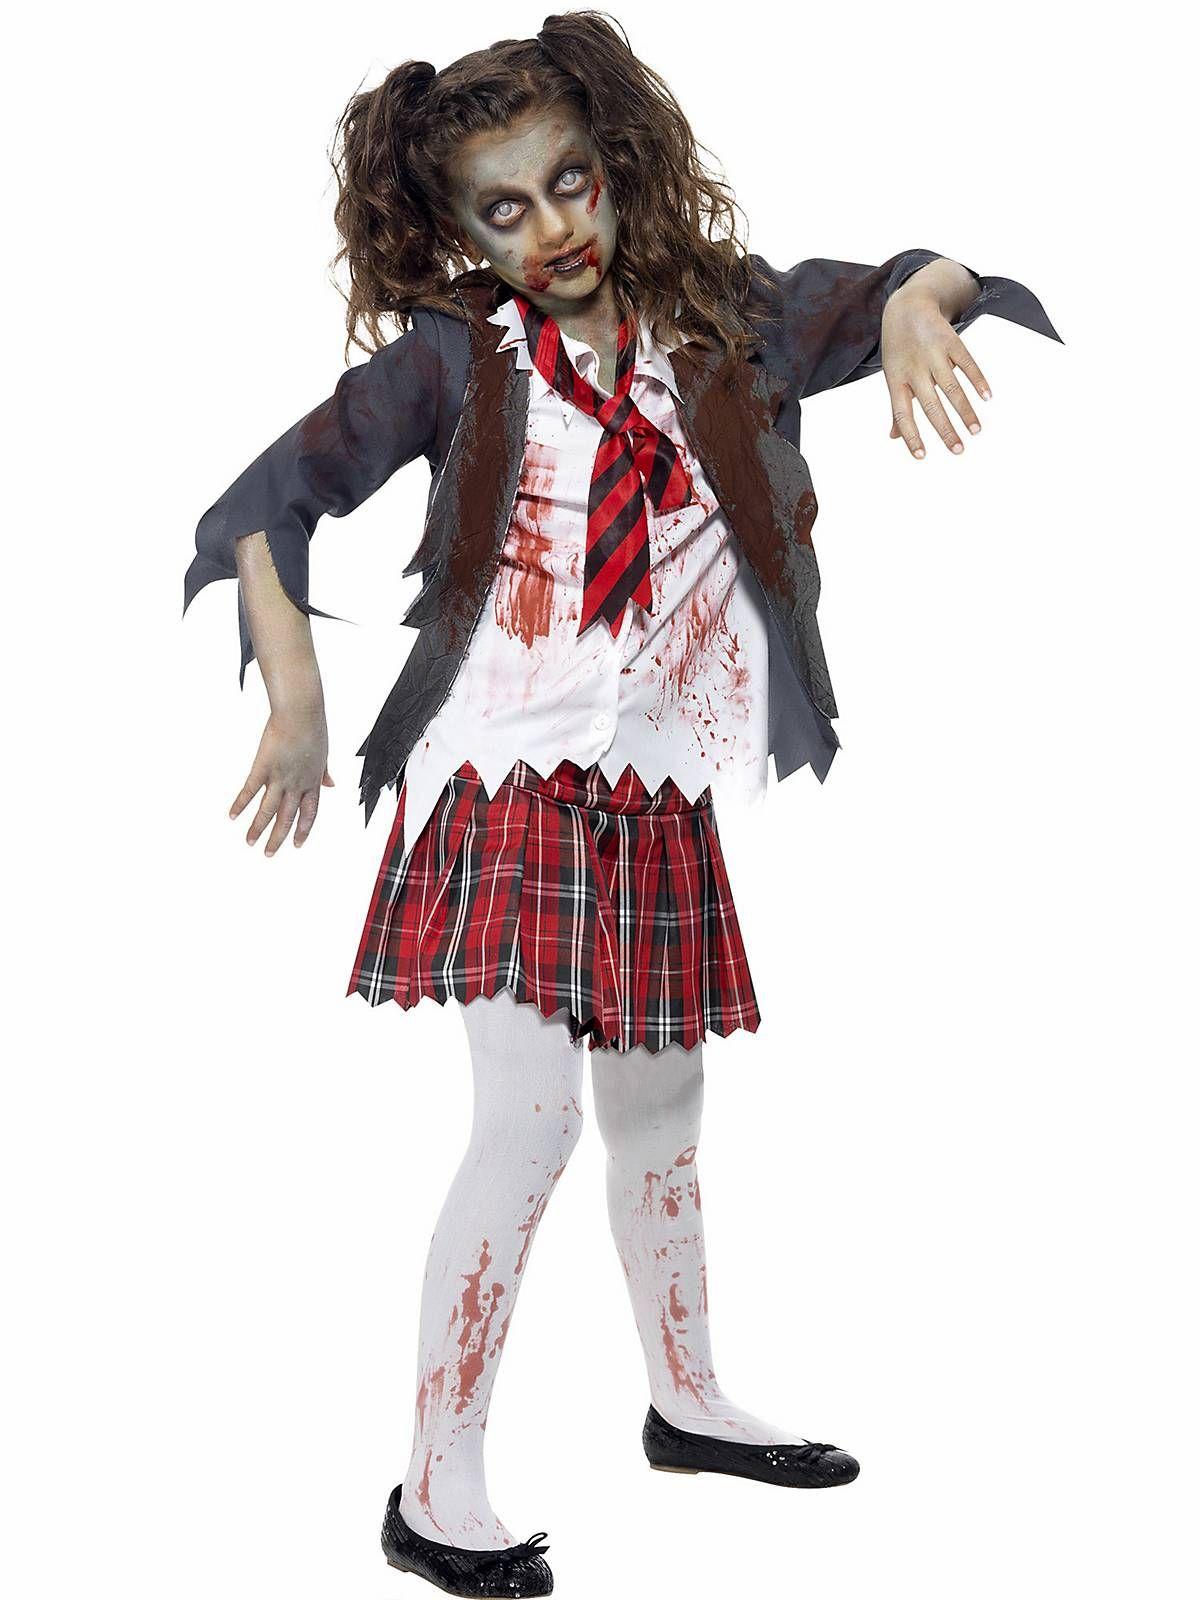 Girls zombie school costume see more costume ideas for halloween girls zombie school costume see more costume ideas for halloween and more at costumesupercenter solutioingenieria Gallery